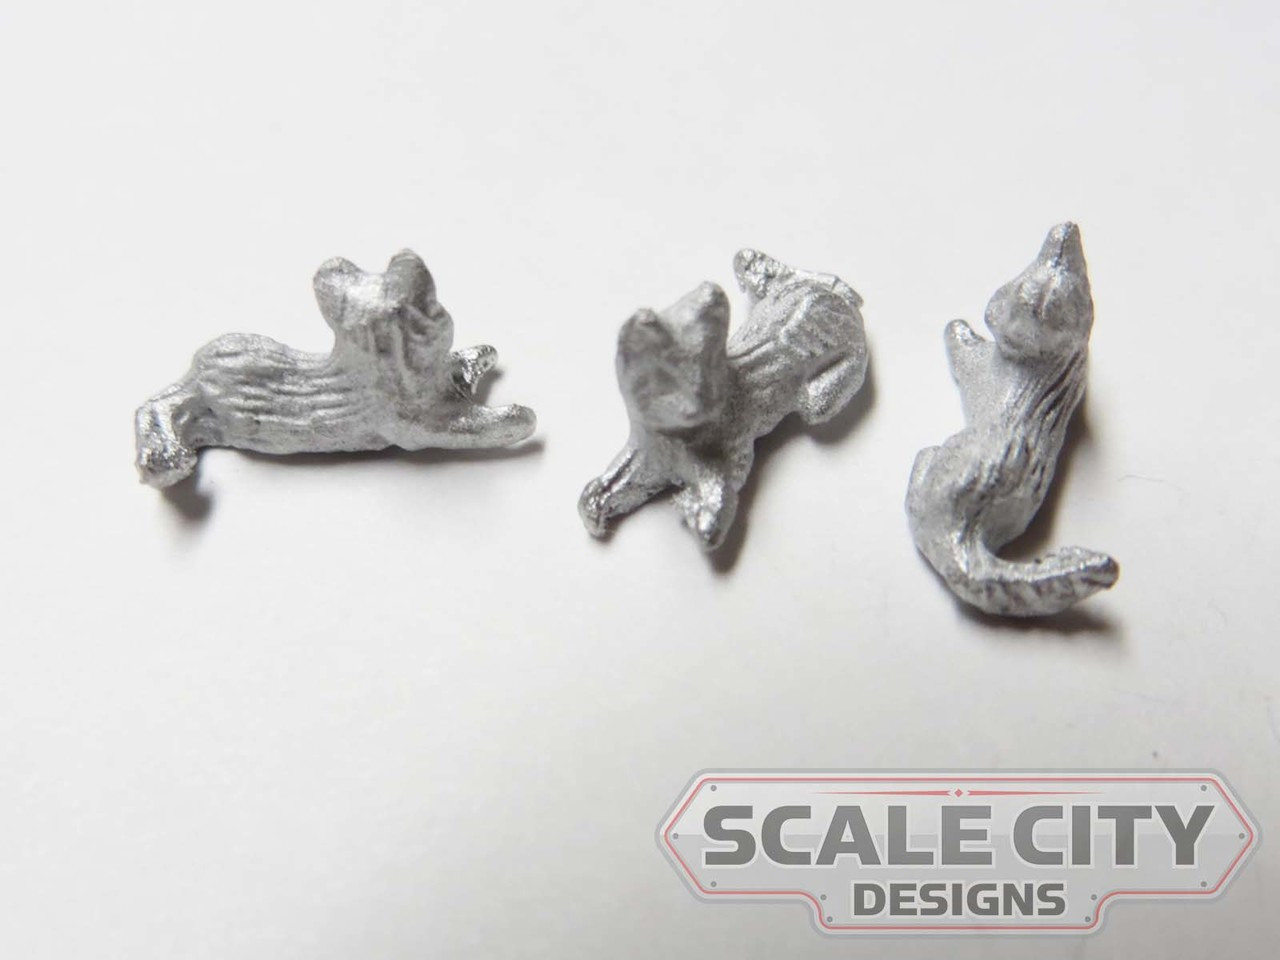 48-1266 Cats Kittens Figure O Scale FKA Keil Line